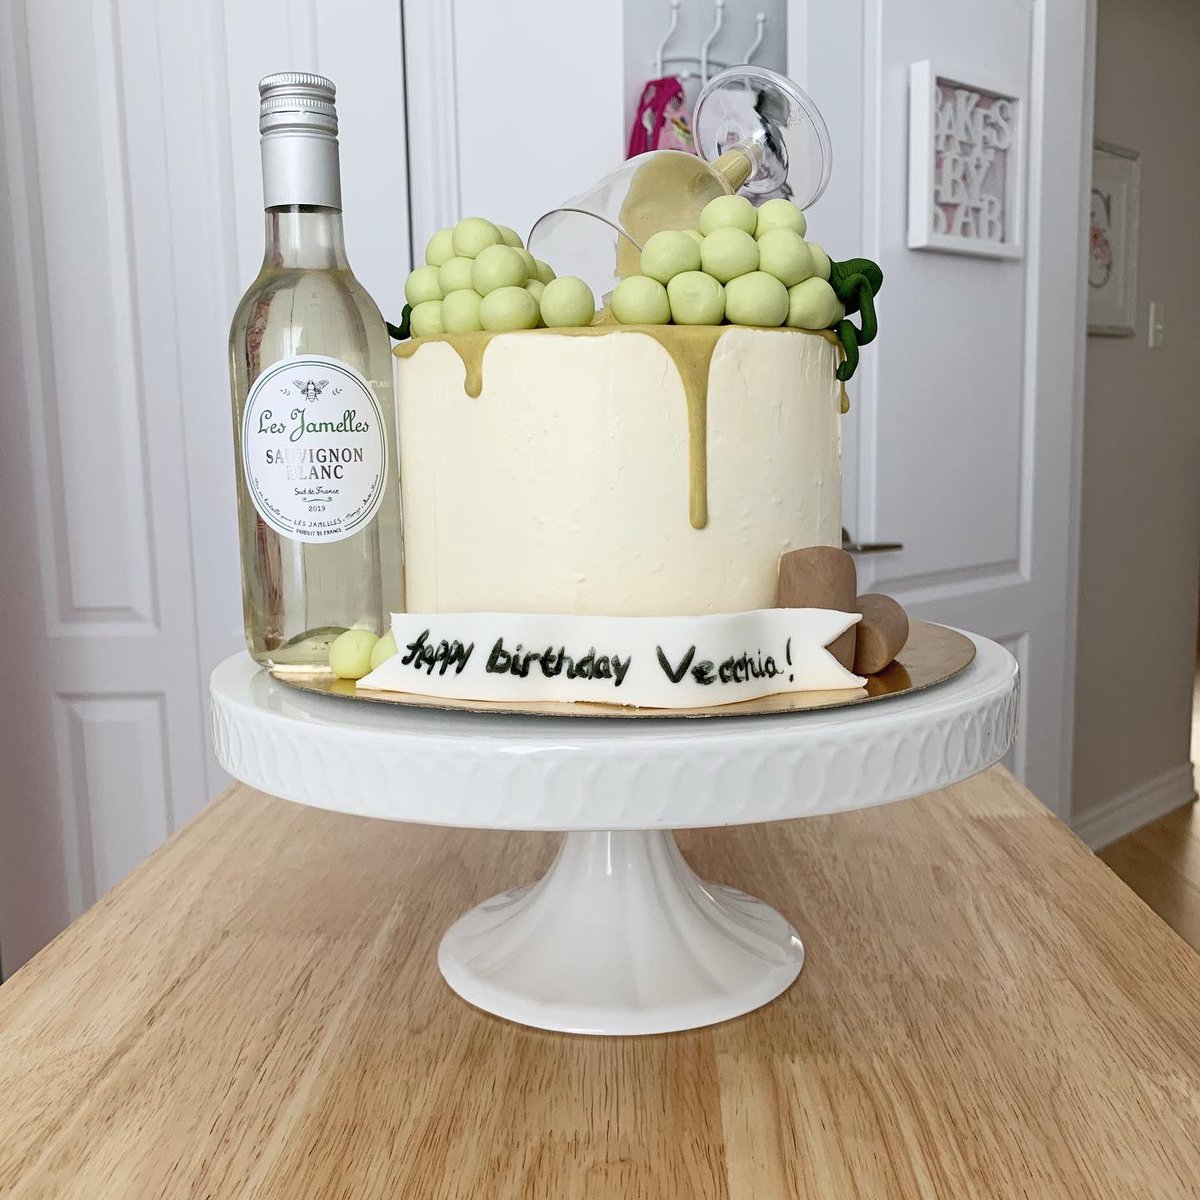 Prime Sabrina Degni On Twitter White Wine Birthday Bakesbysab Funny Birthday Cards Online Ioscodamsfinfo